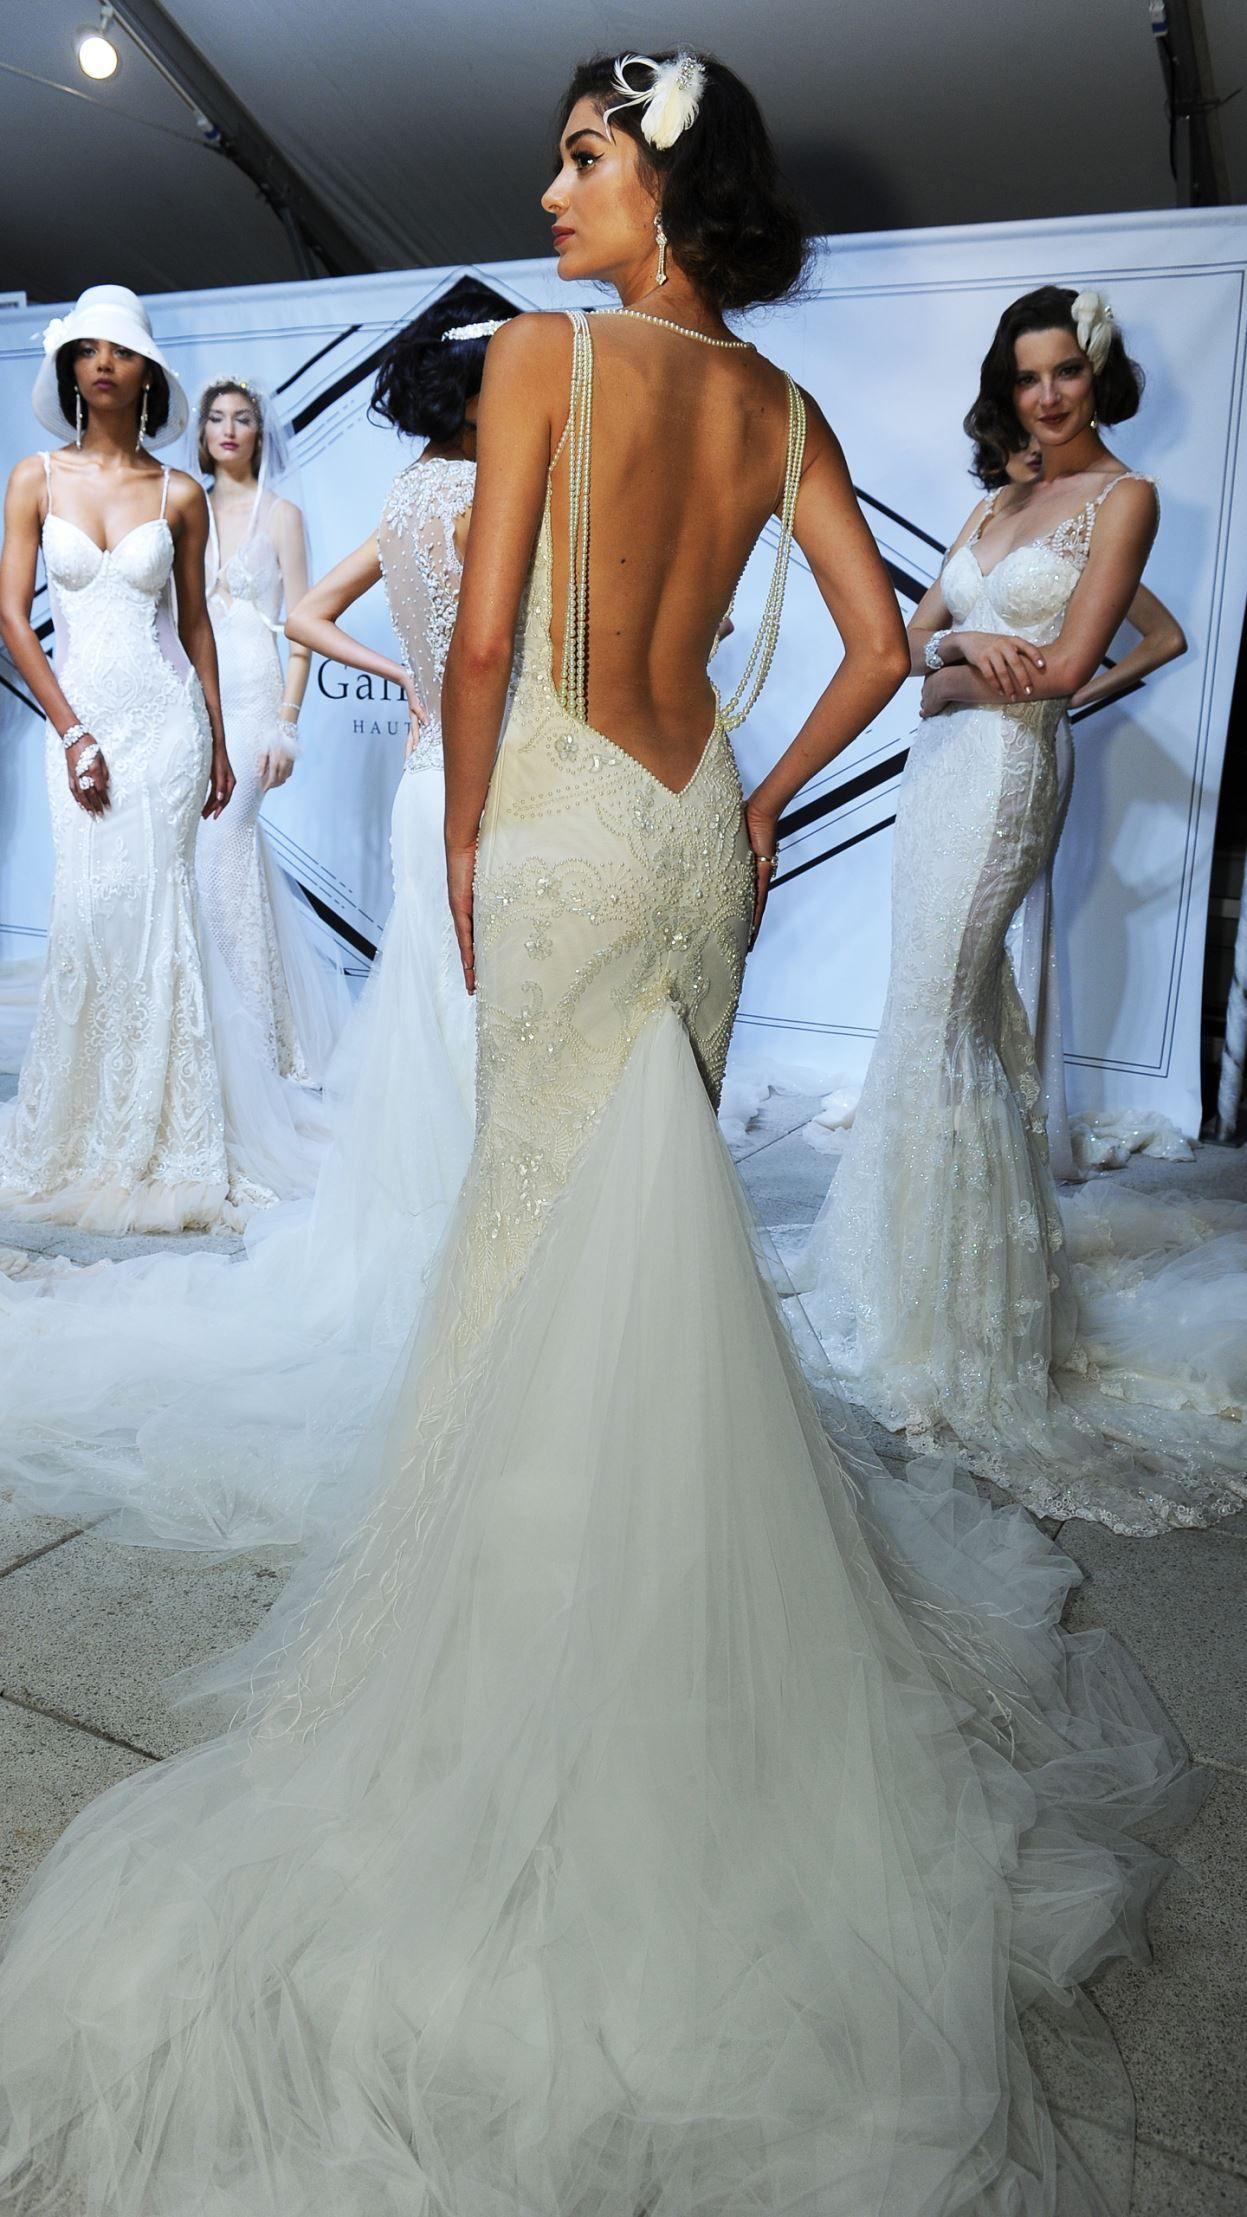 new ucsomething blueud wedding ideas fashion weeks sexy and sexy